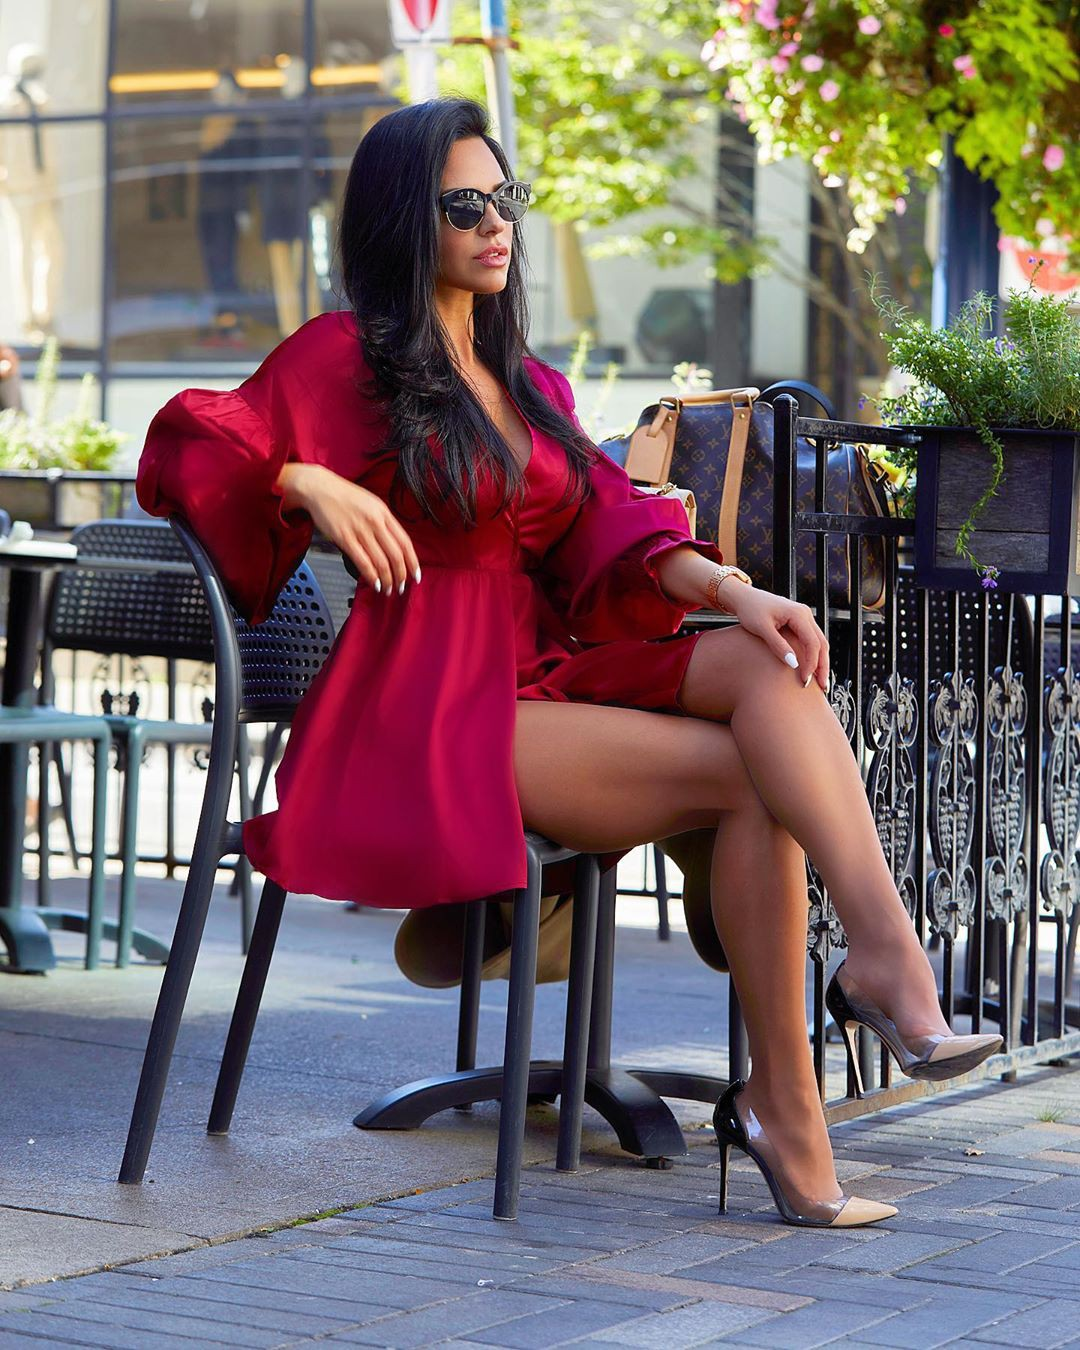 Shadi Y Cair hot legs girls, legs photo, high heels